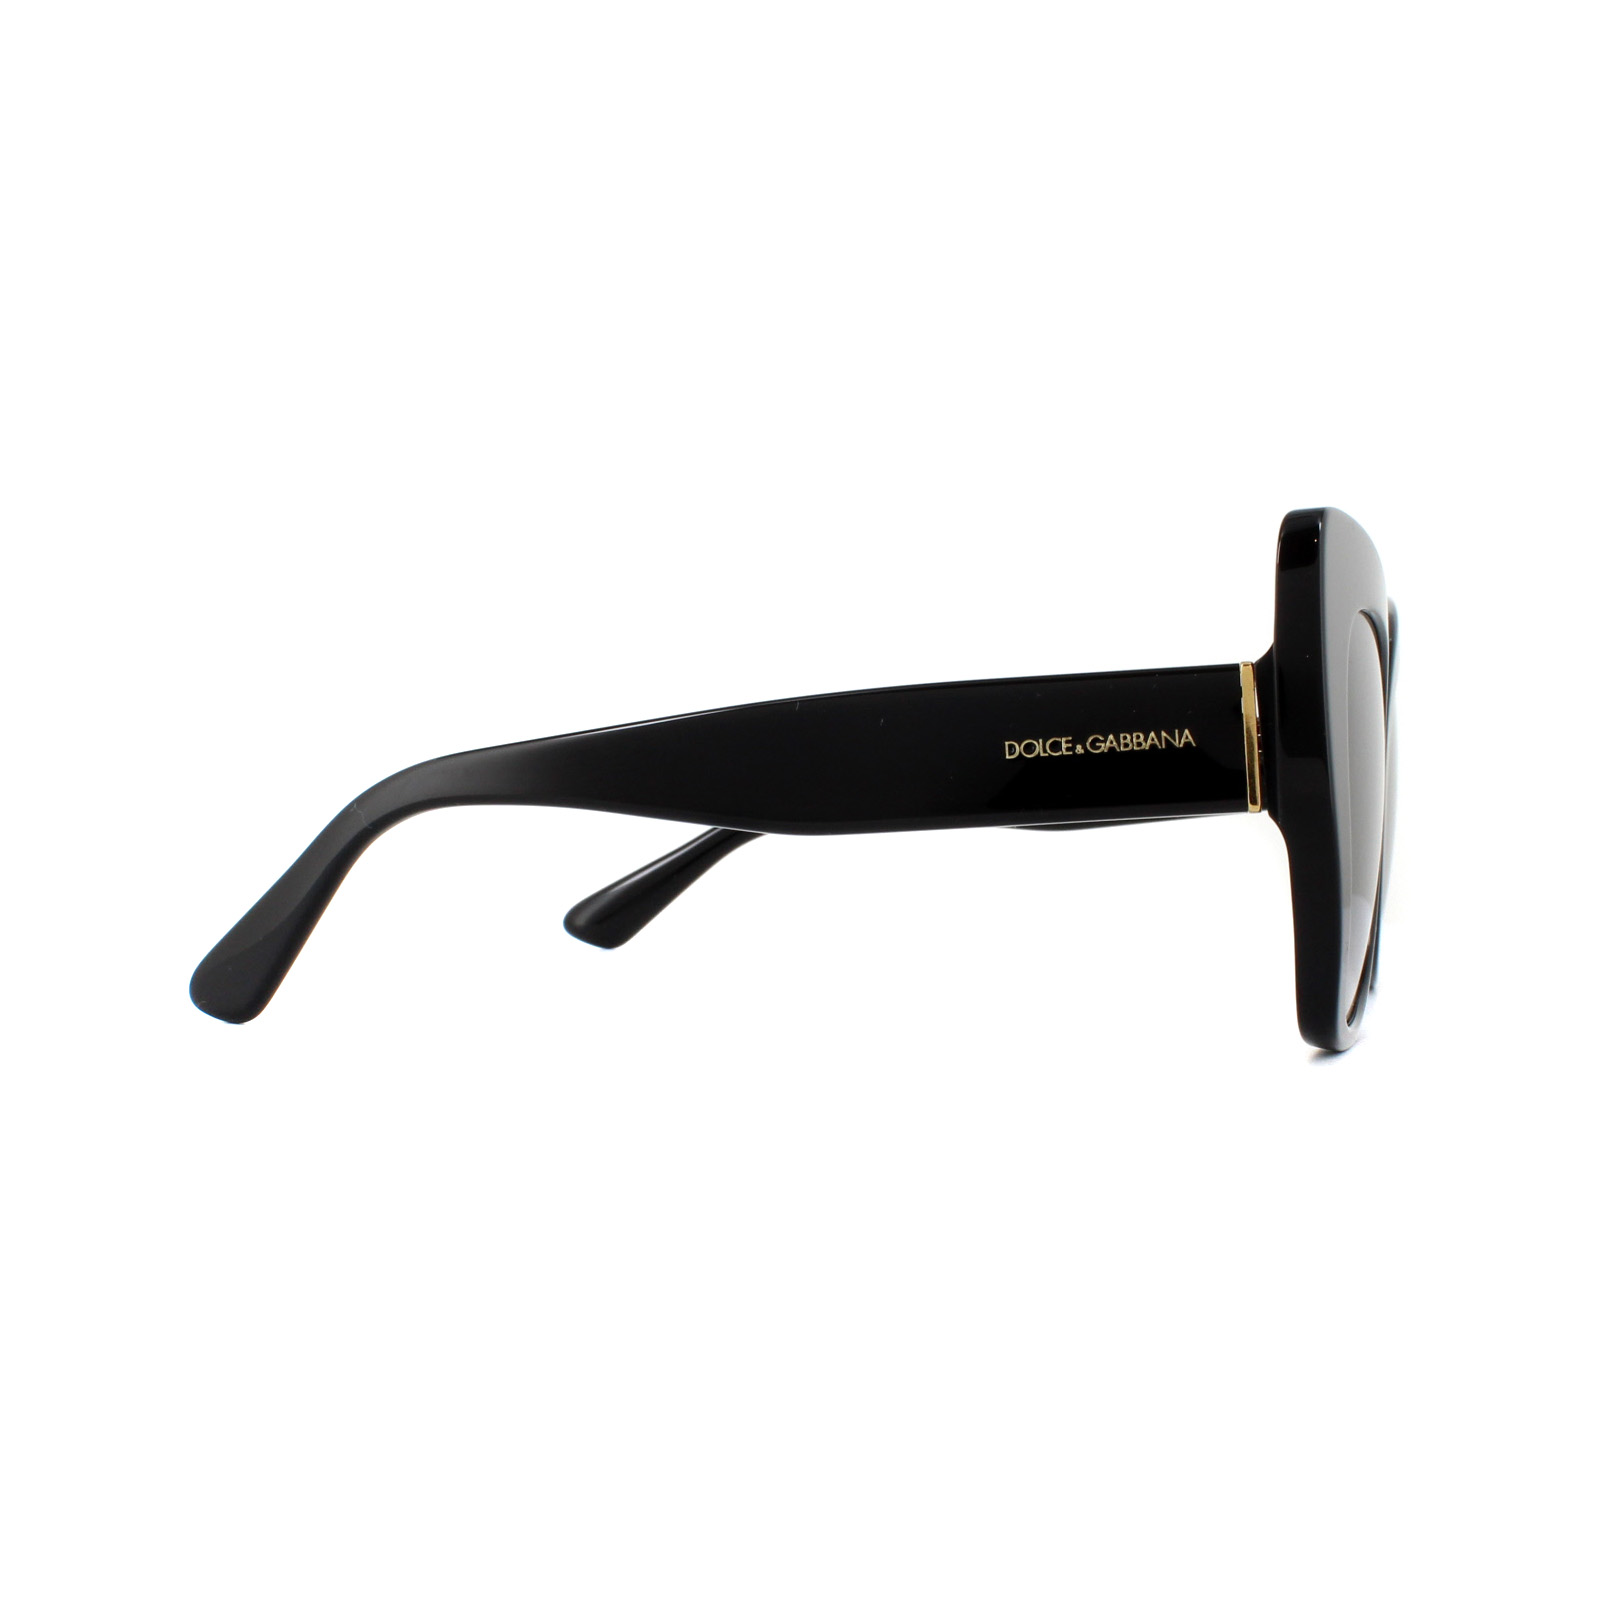 Dolce   Gabbana Sunglasses DG4319 501 8G Black Grey Gradient   eBay 61b002fbae